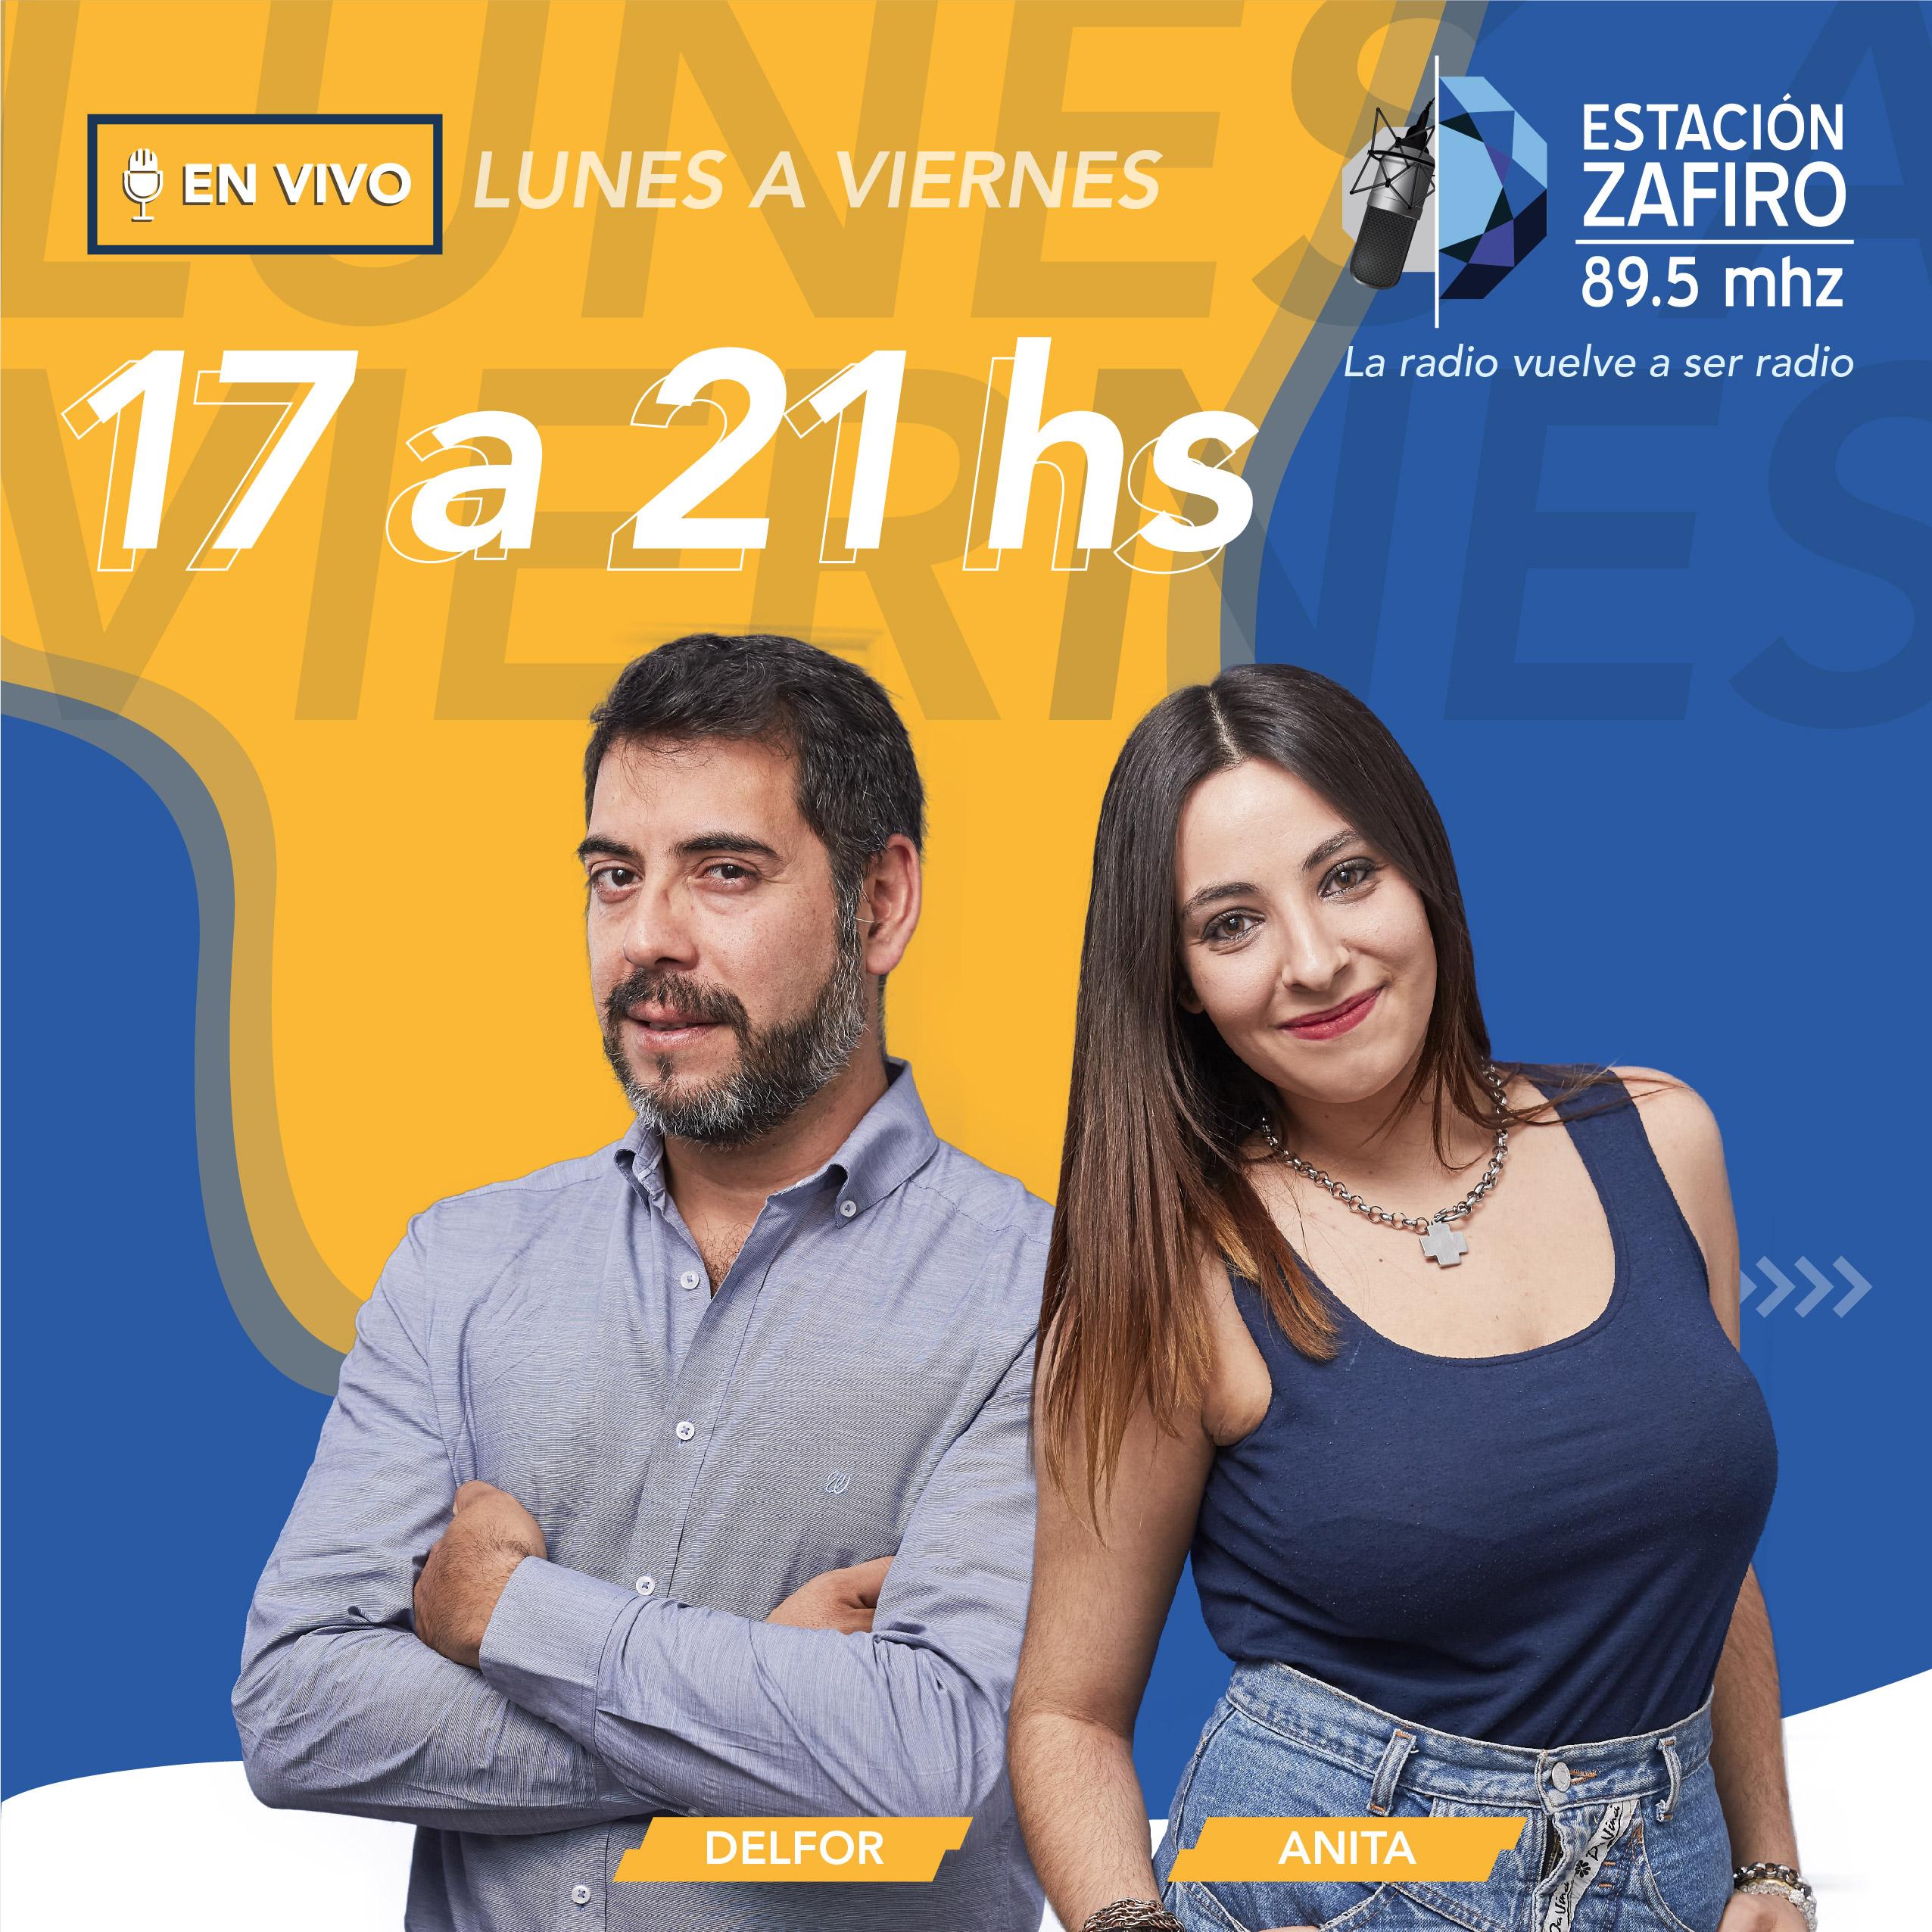 https://zafirocontenidos.com/wp-content/uploads/2019/04/Programa-17-a-21.jpg